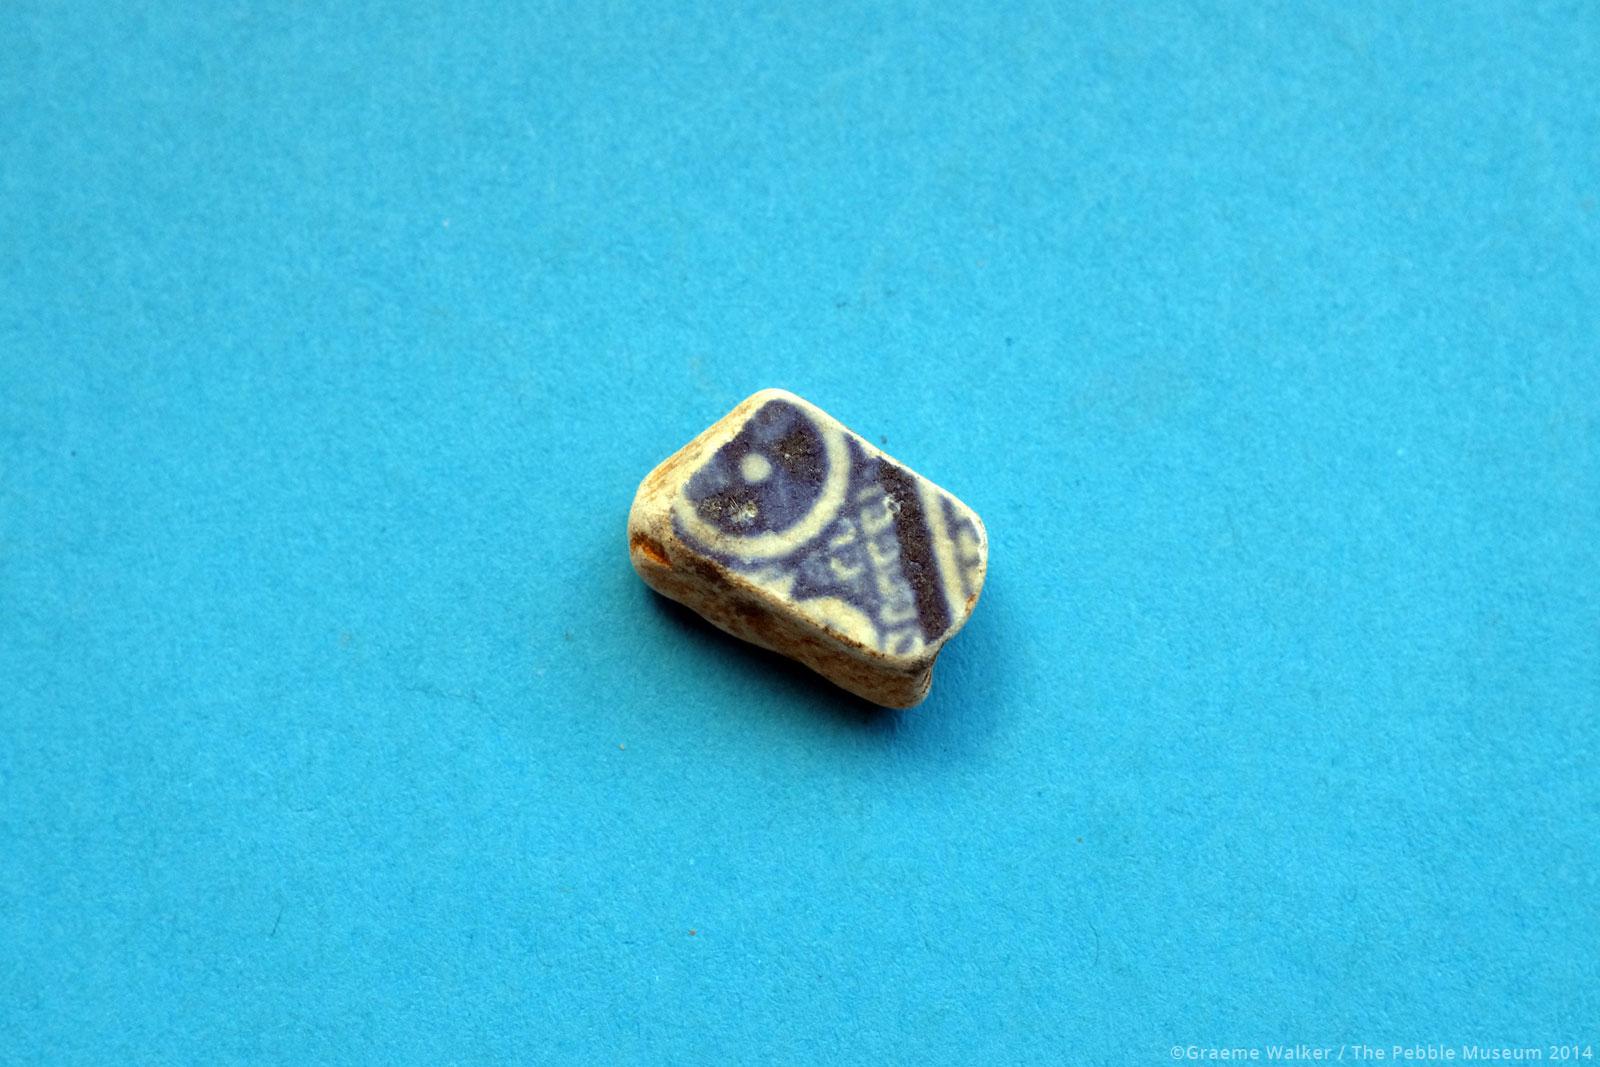 Blue and White Ceramic © Graeme Walker / The Pebble Museum 2019